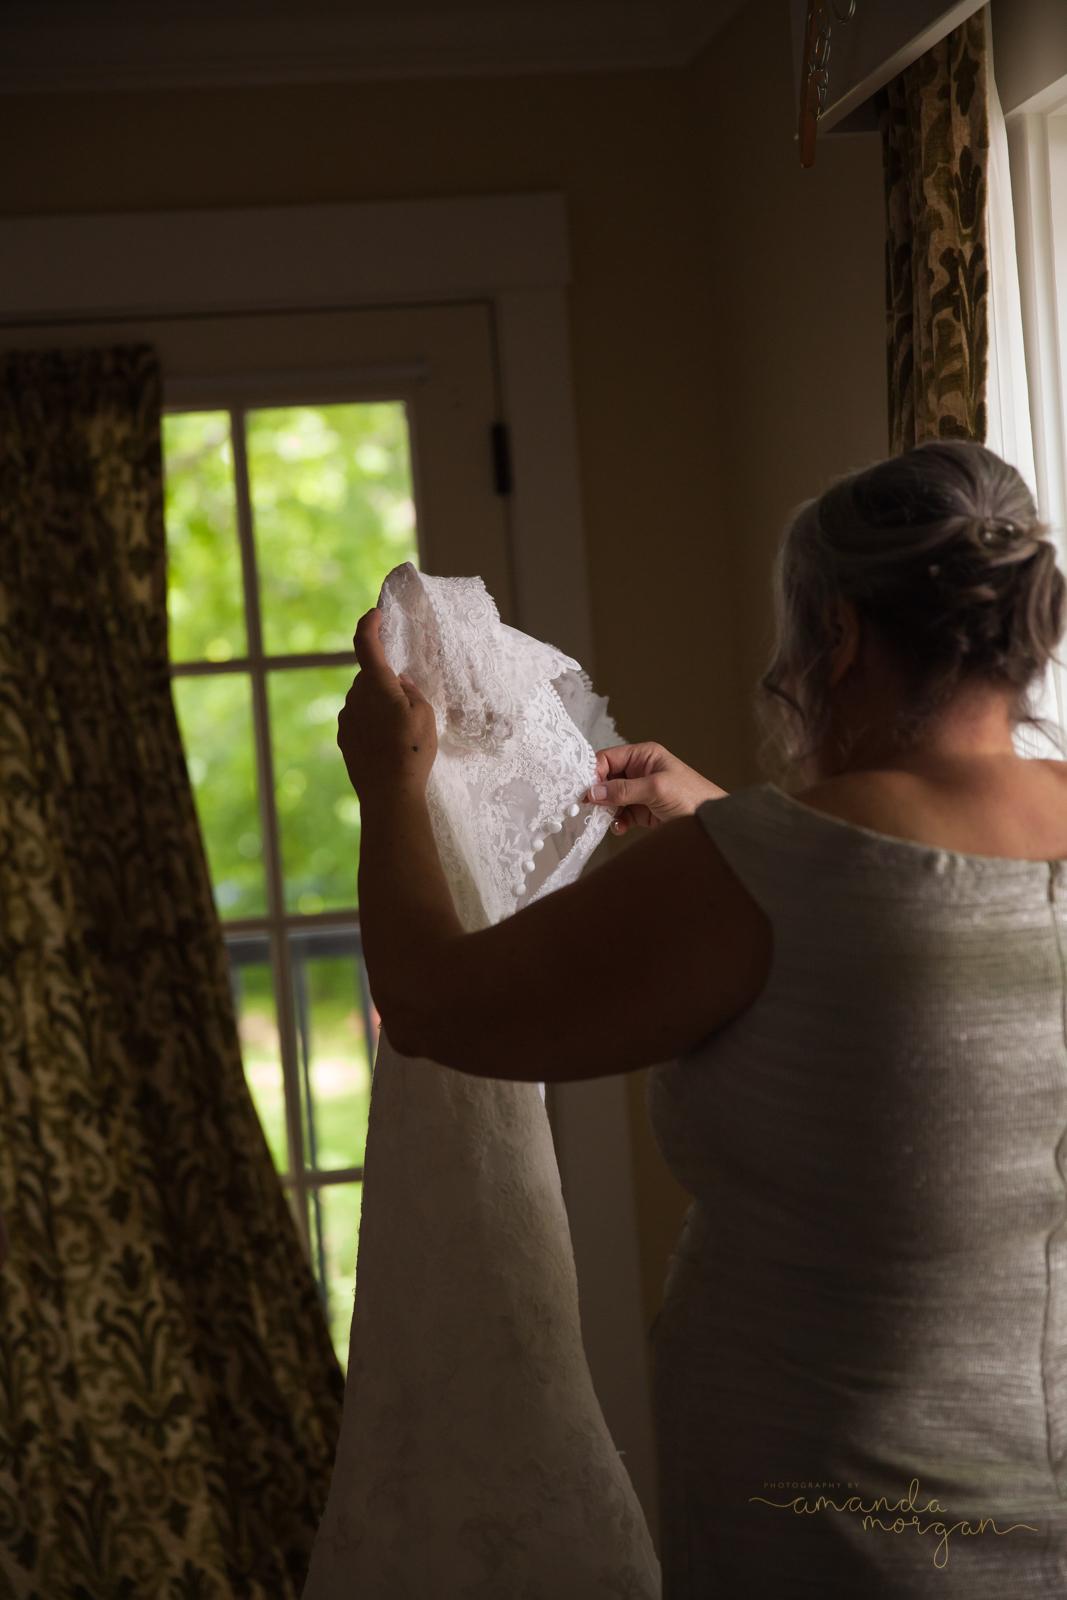 Publick-House-Wedding-Amanda-Morgan-8.jpg